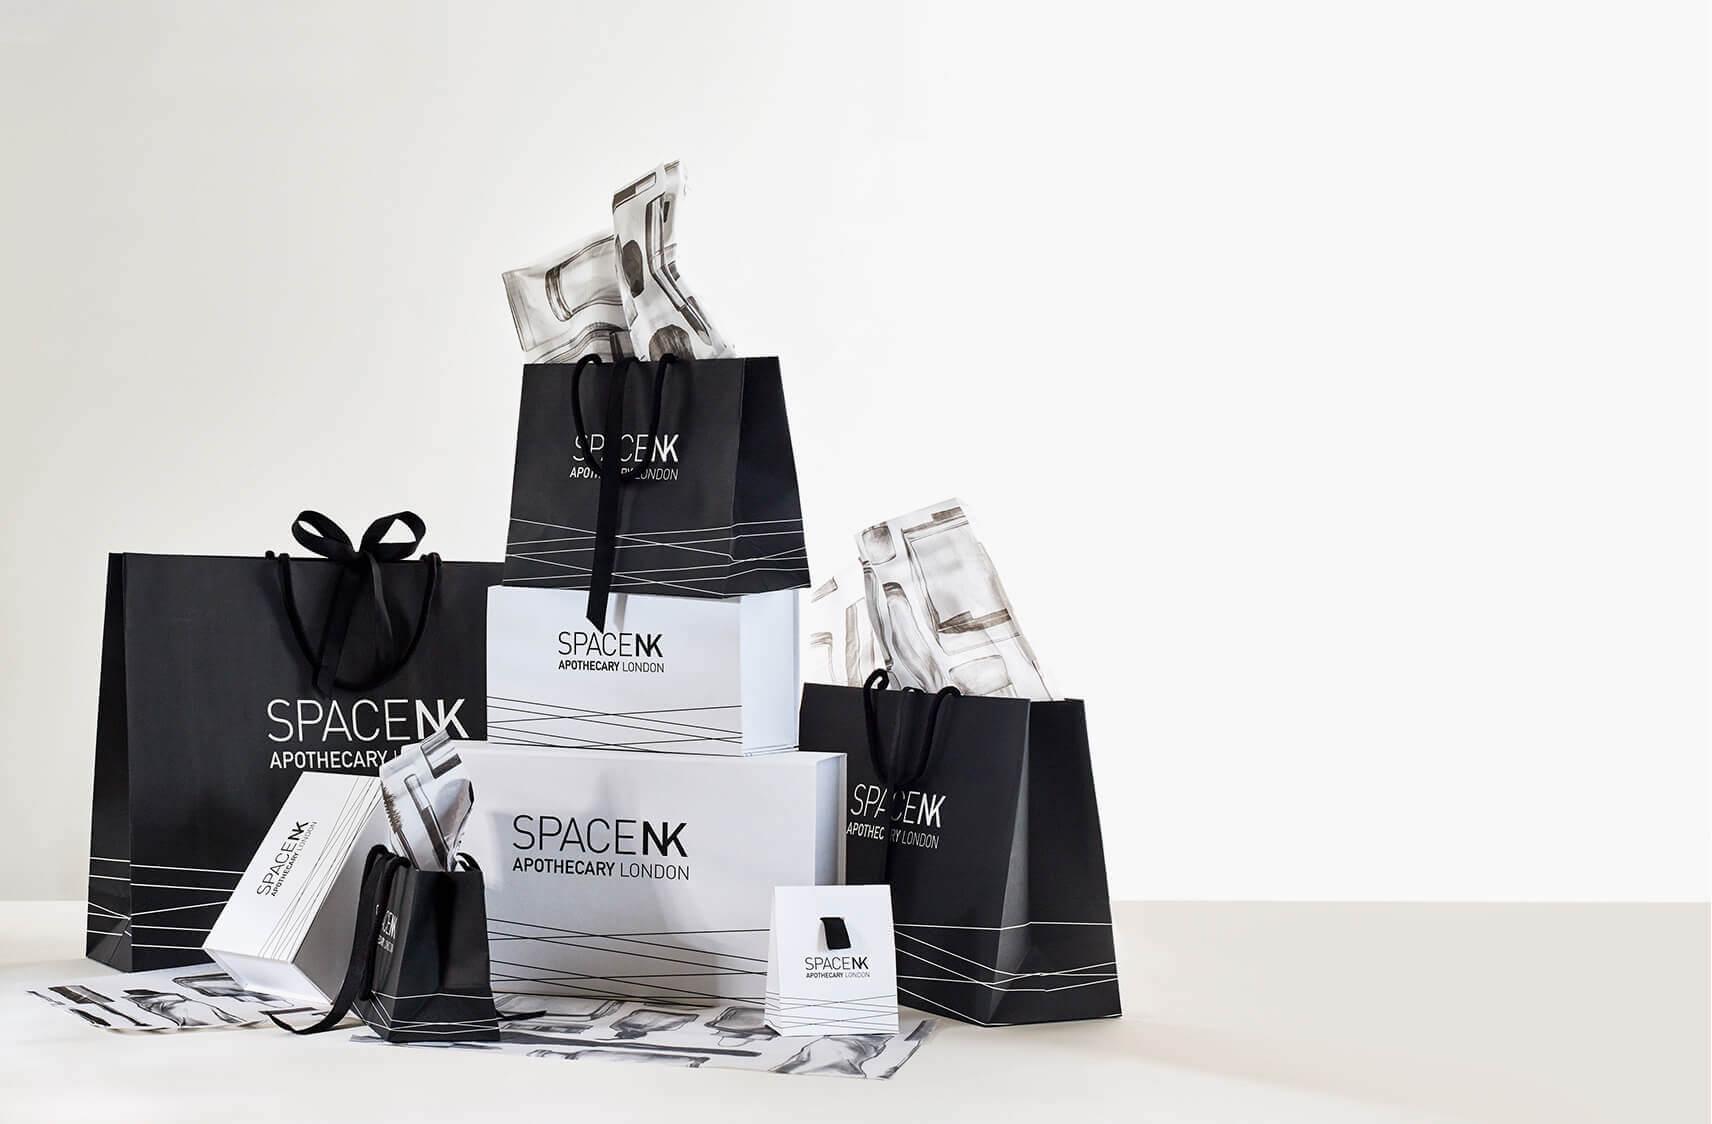 space-nk-corproate-gift